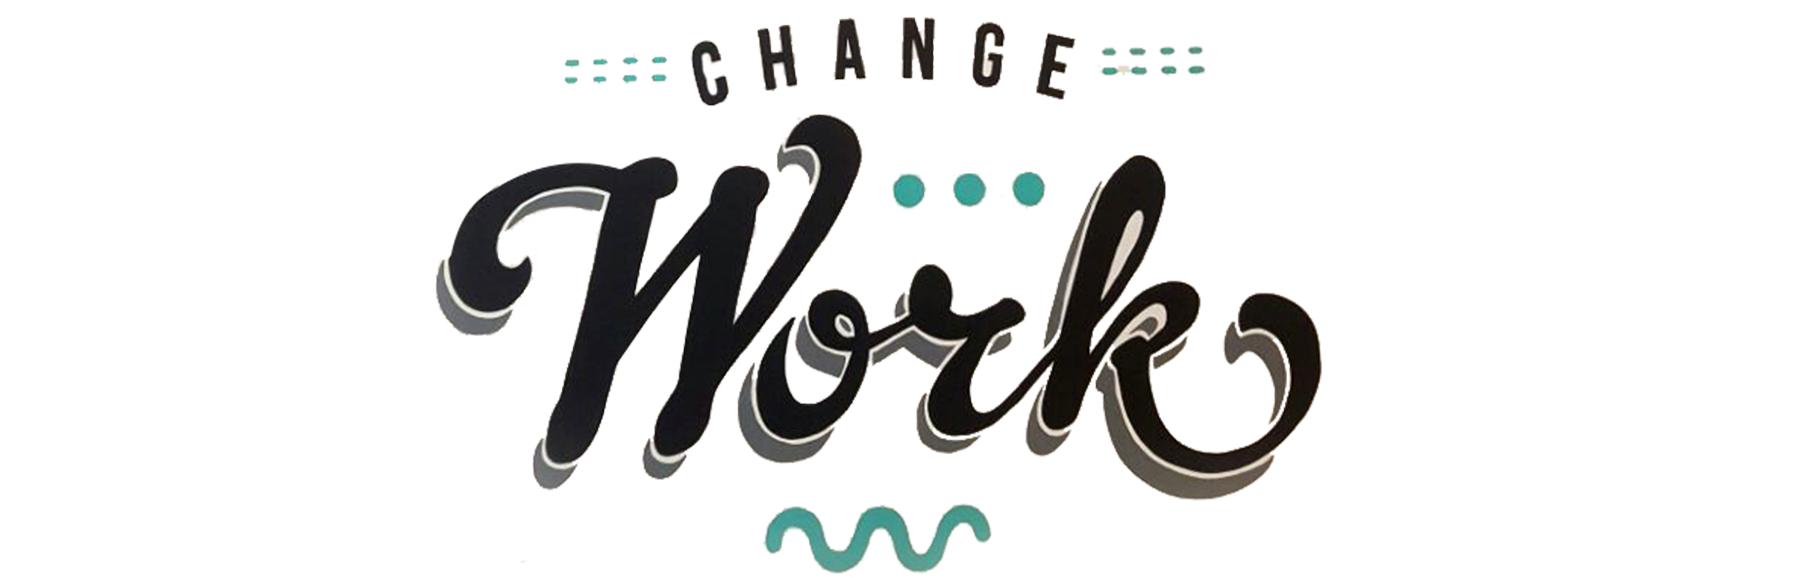 Change-Works